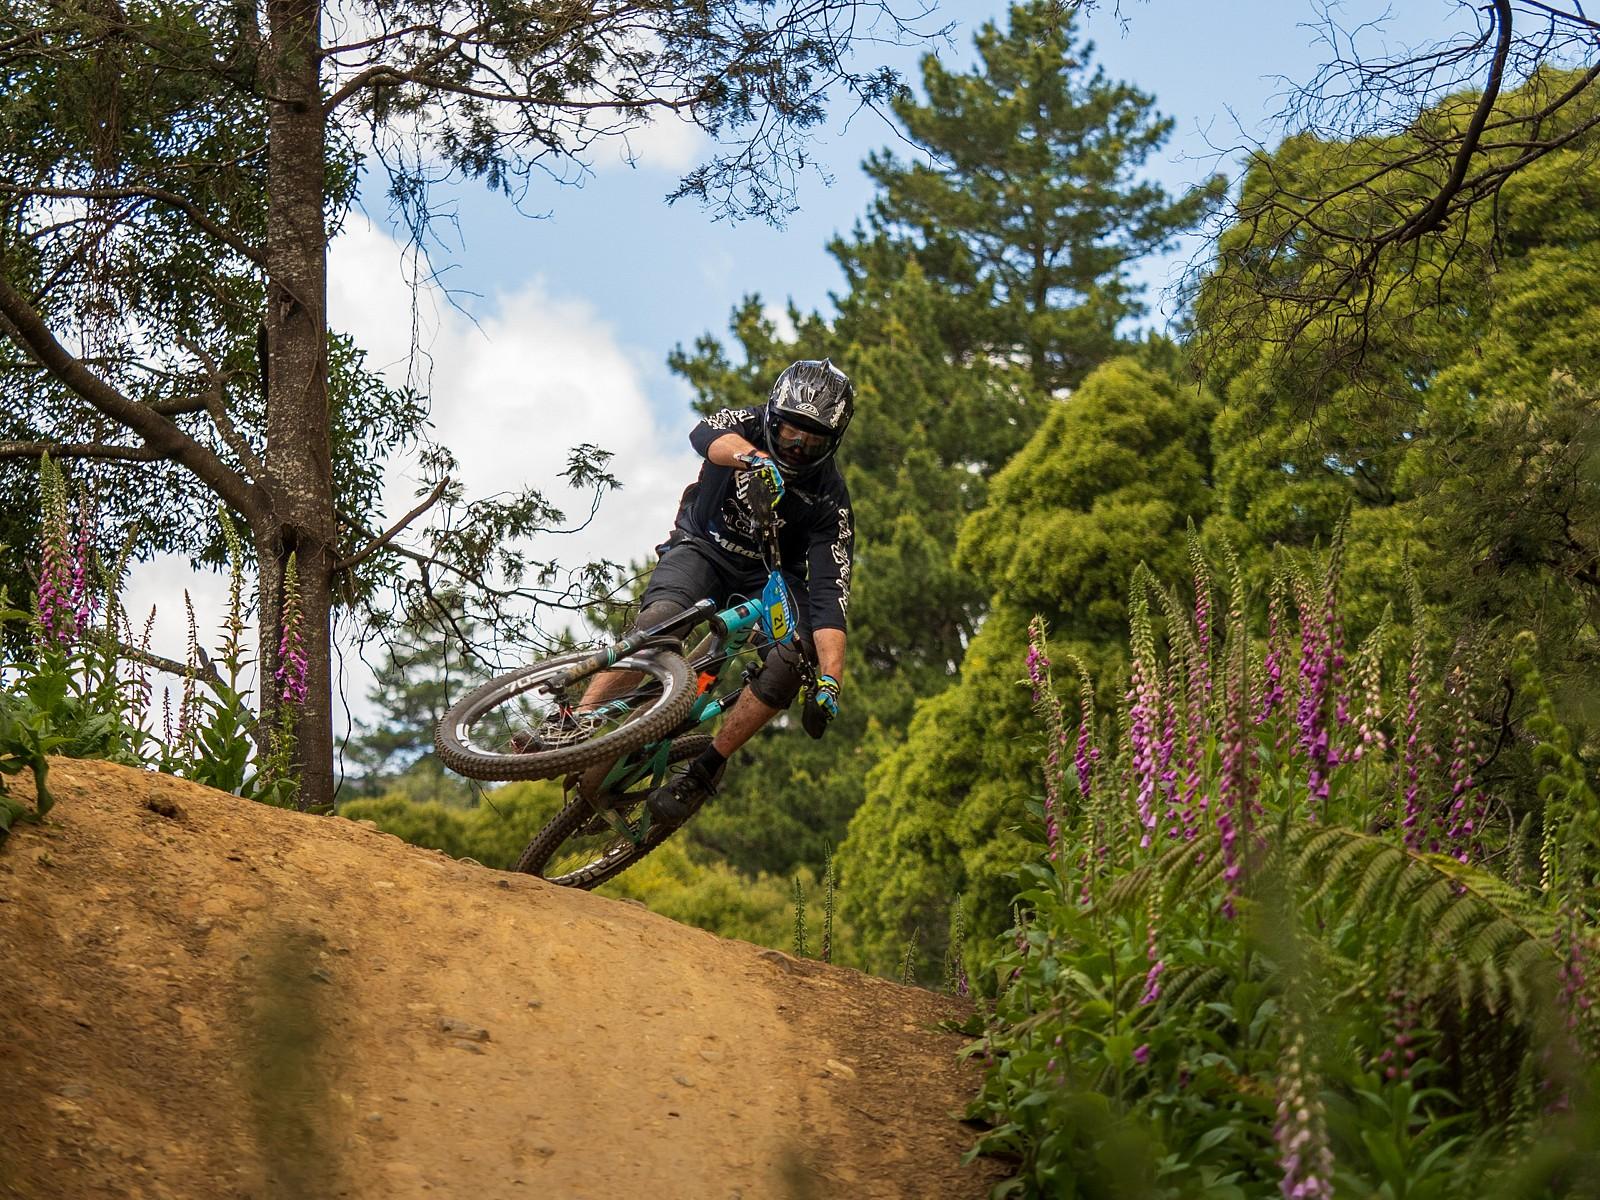 171119-Tassie-1615 - jack.fletcher86 - Mountain Biking Pictures - Vital MTB